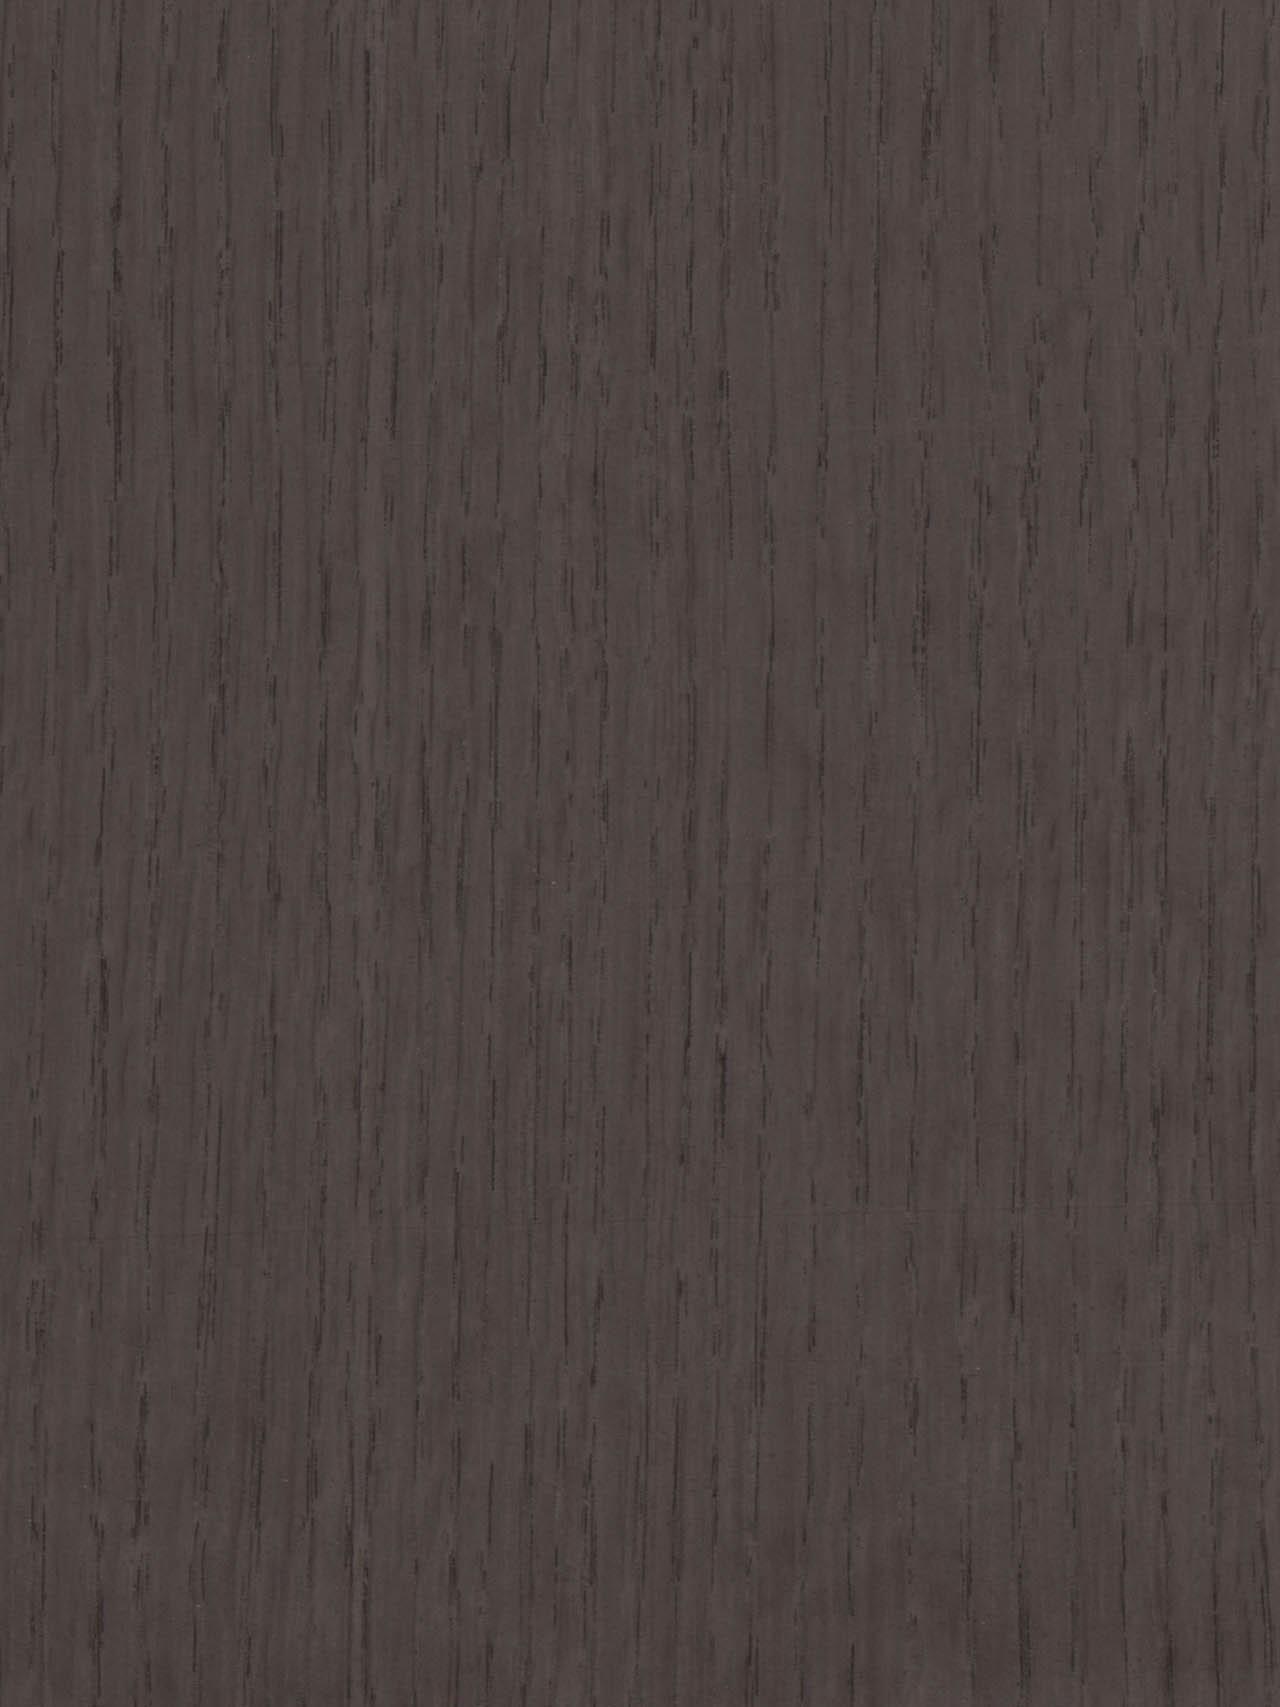 Chapa madera Roble Avellana MBF130